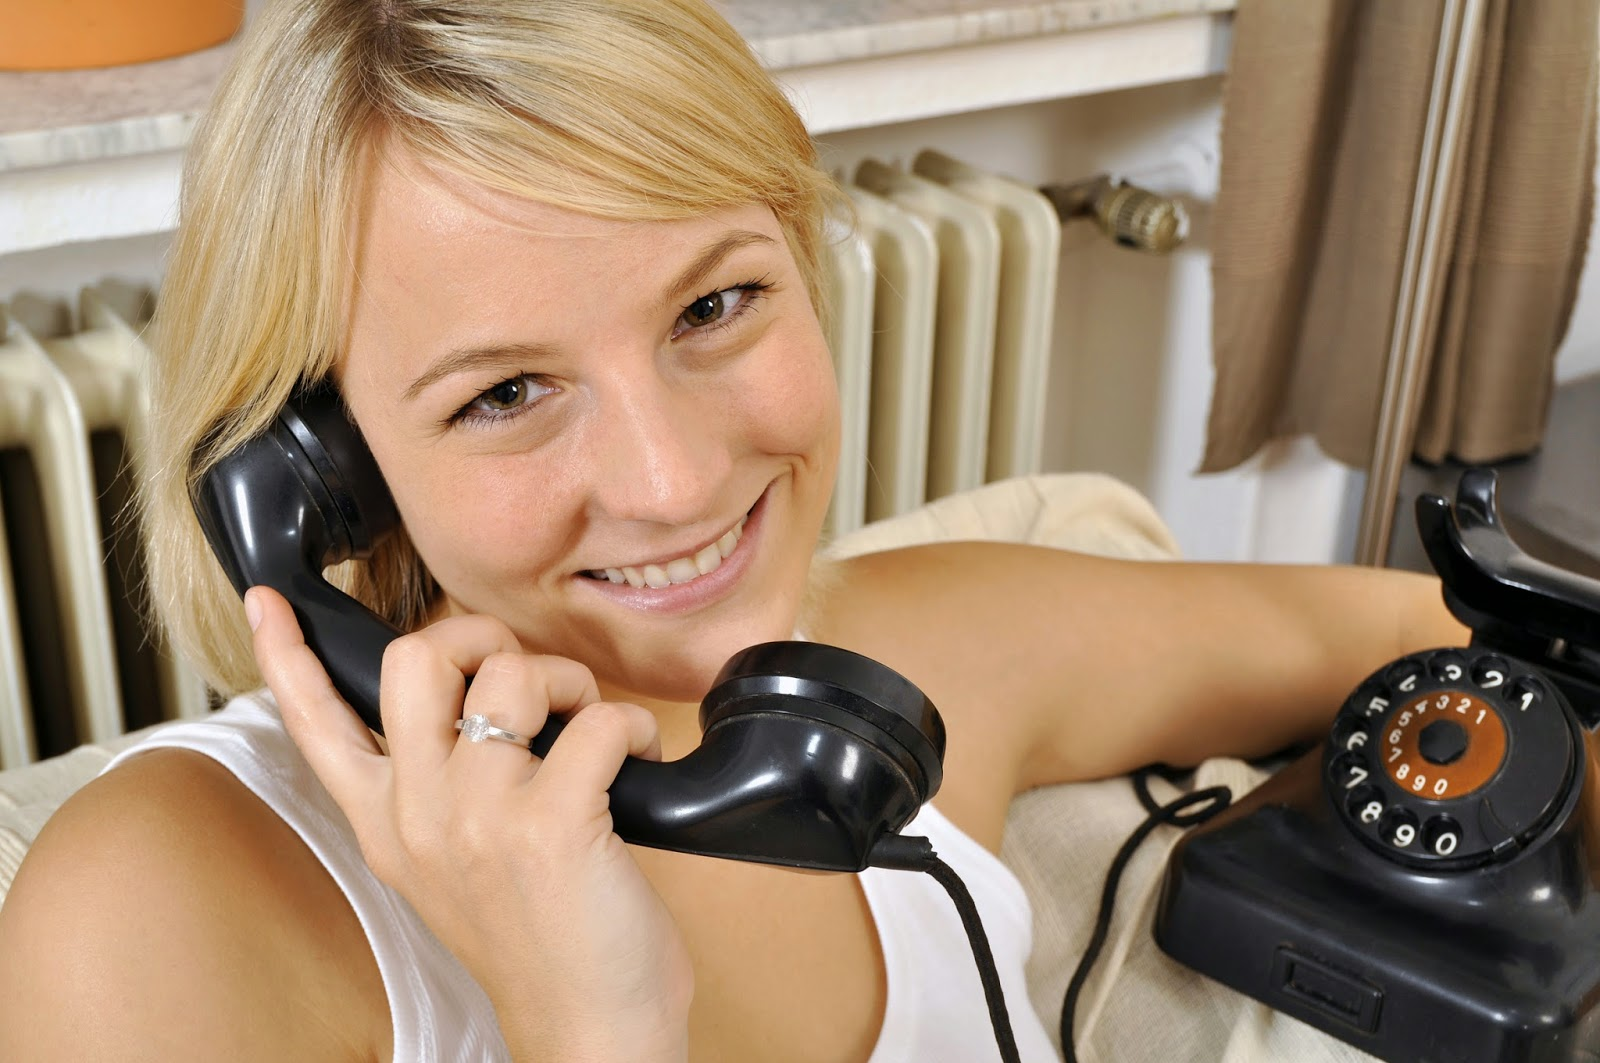 Чат девушек онлайн 9 фотография